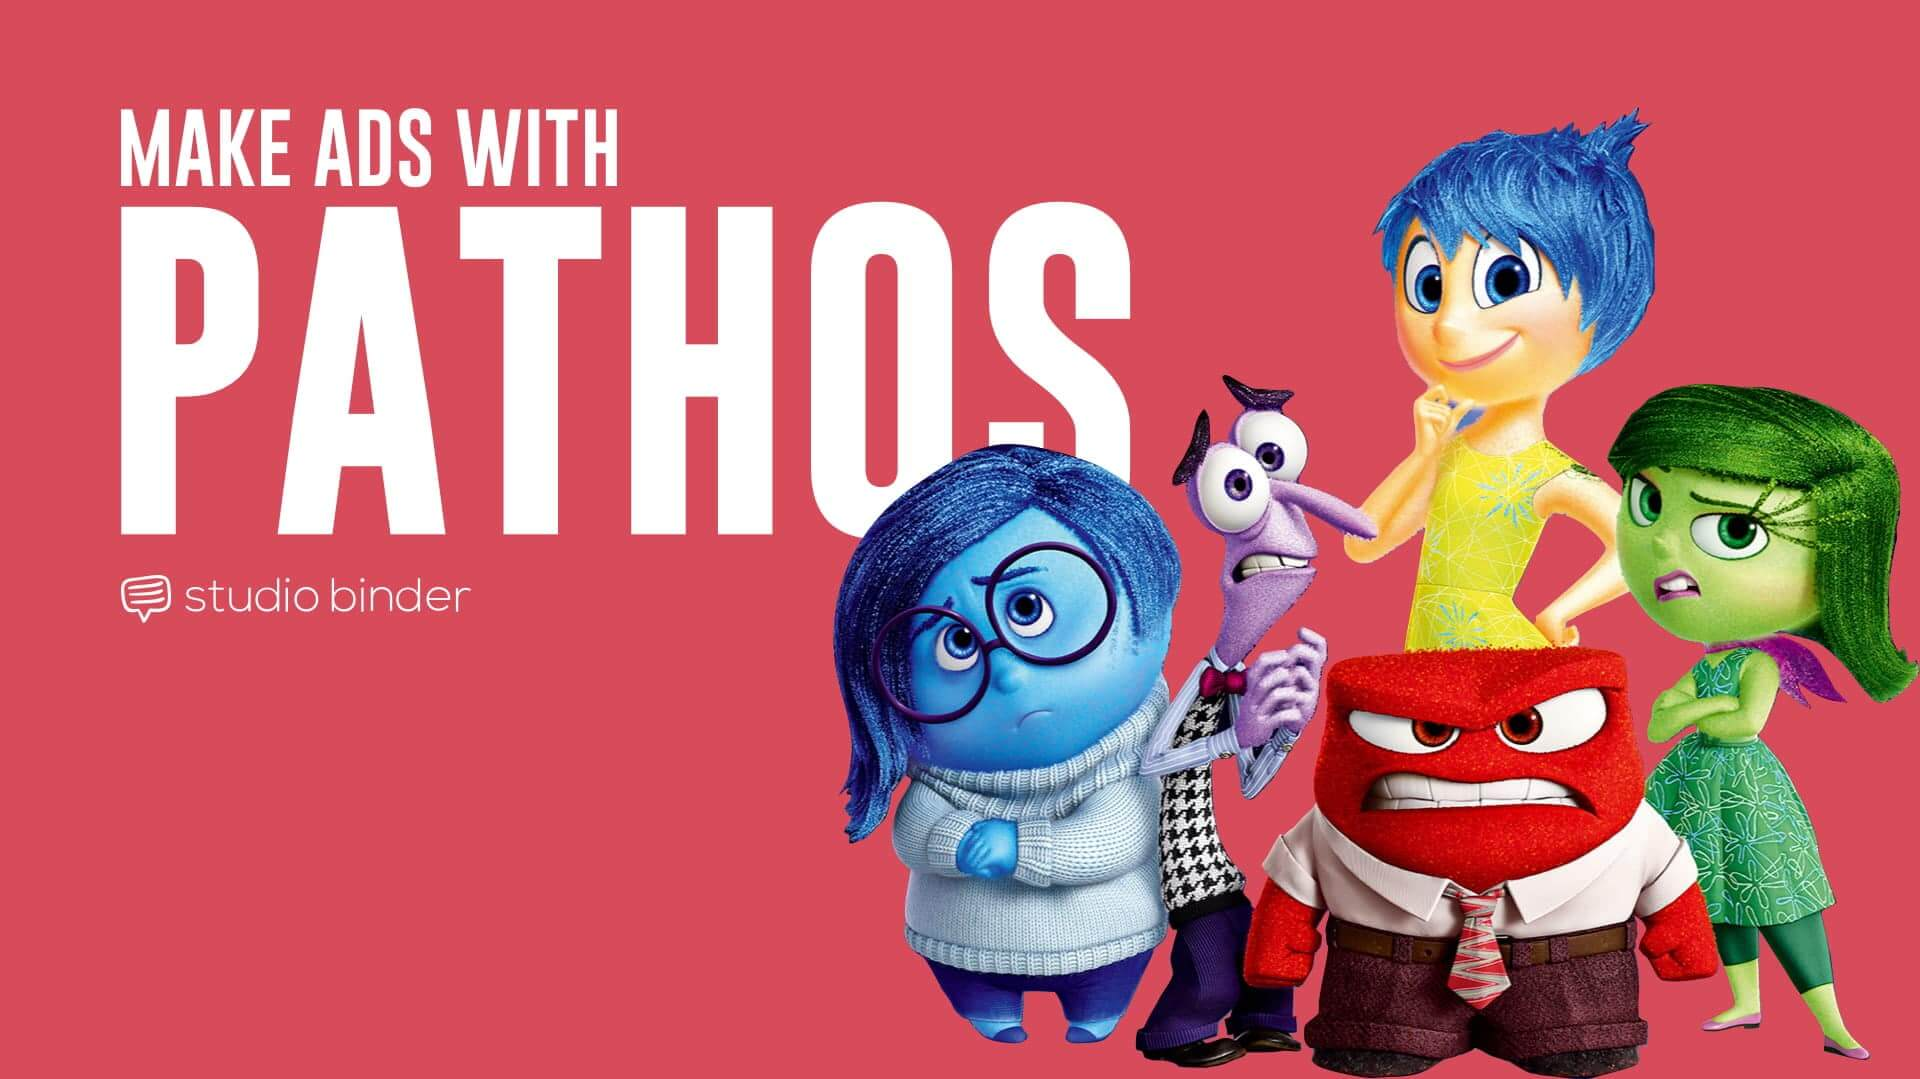 Pathos Advertisement Examples, Pathos Definition & Aristotle Rhetoric